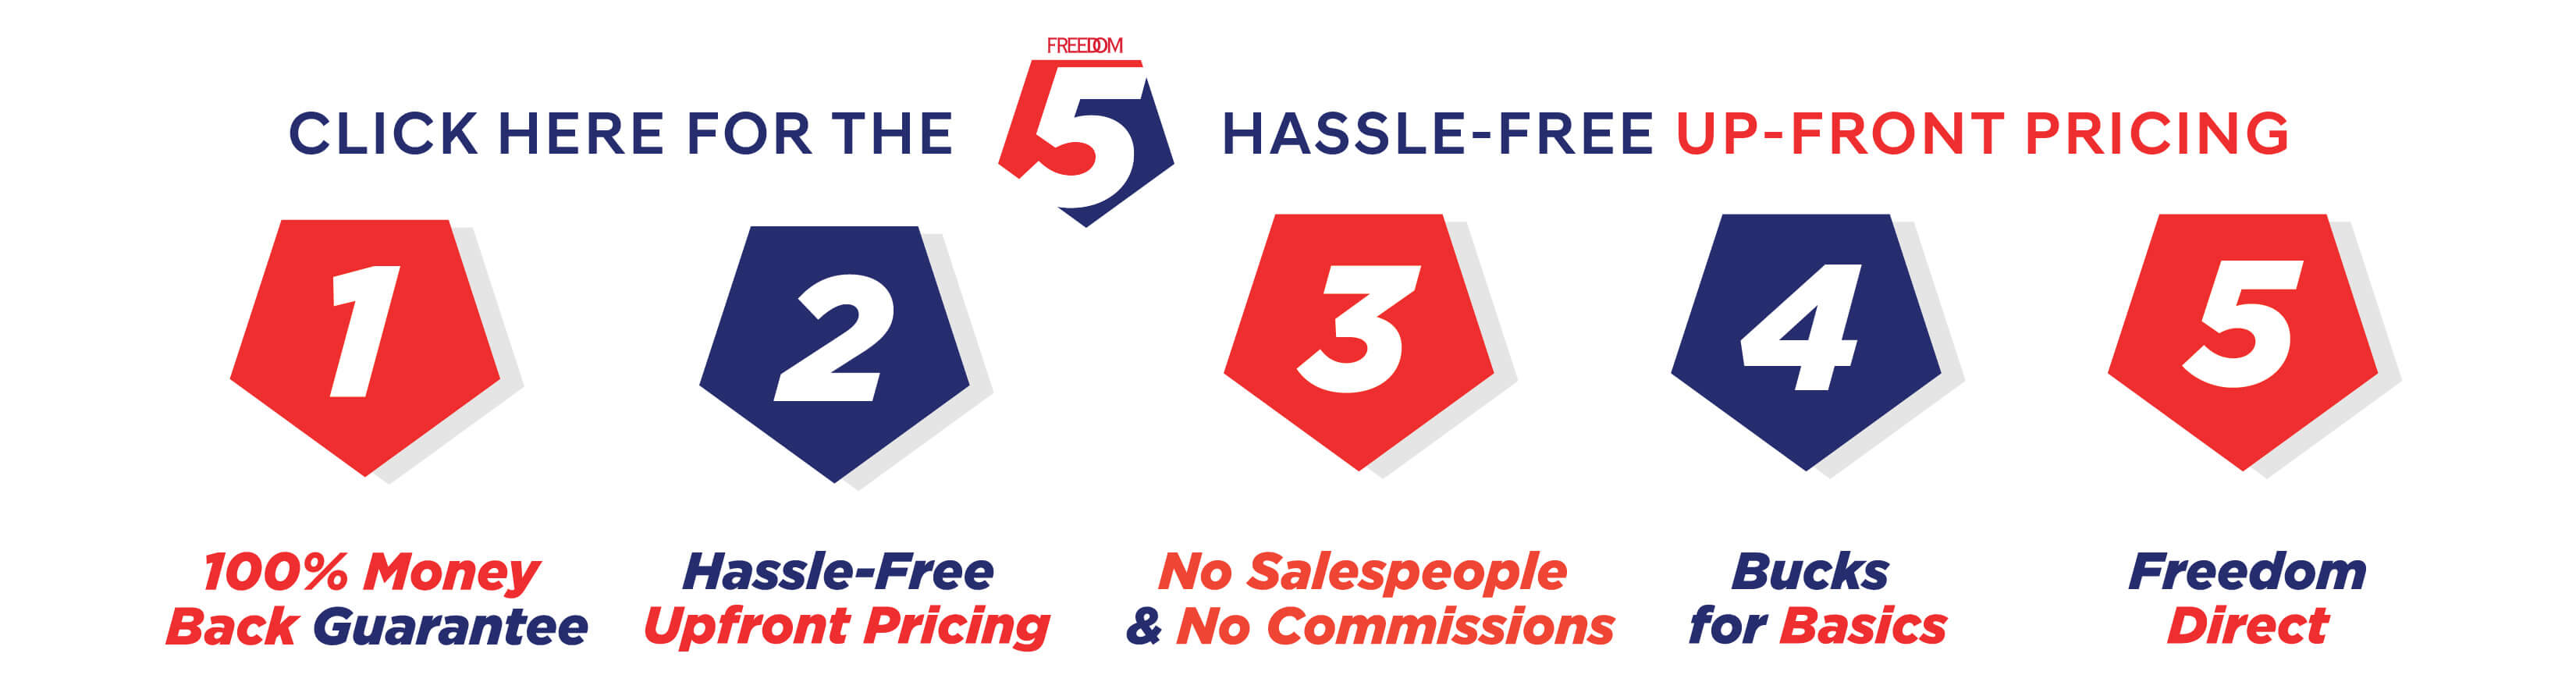 Freedom 5 Program